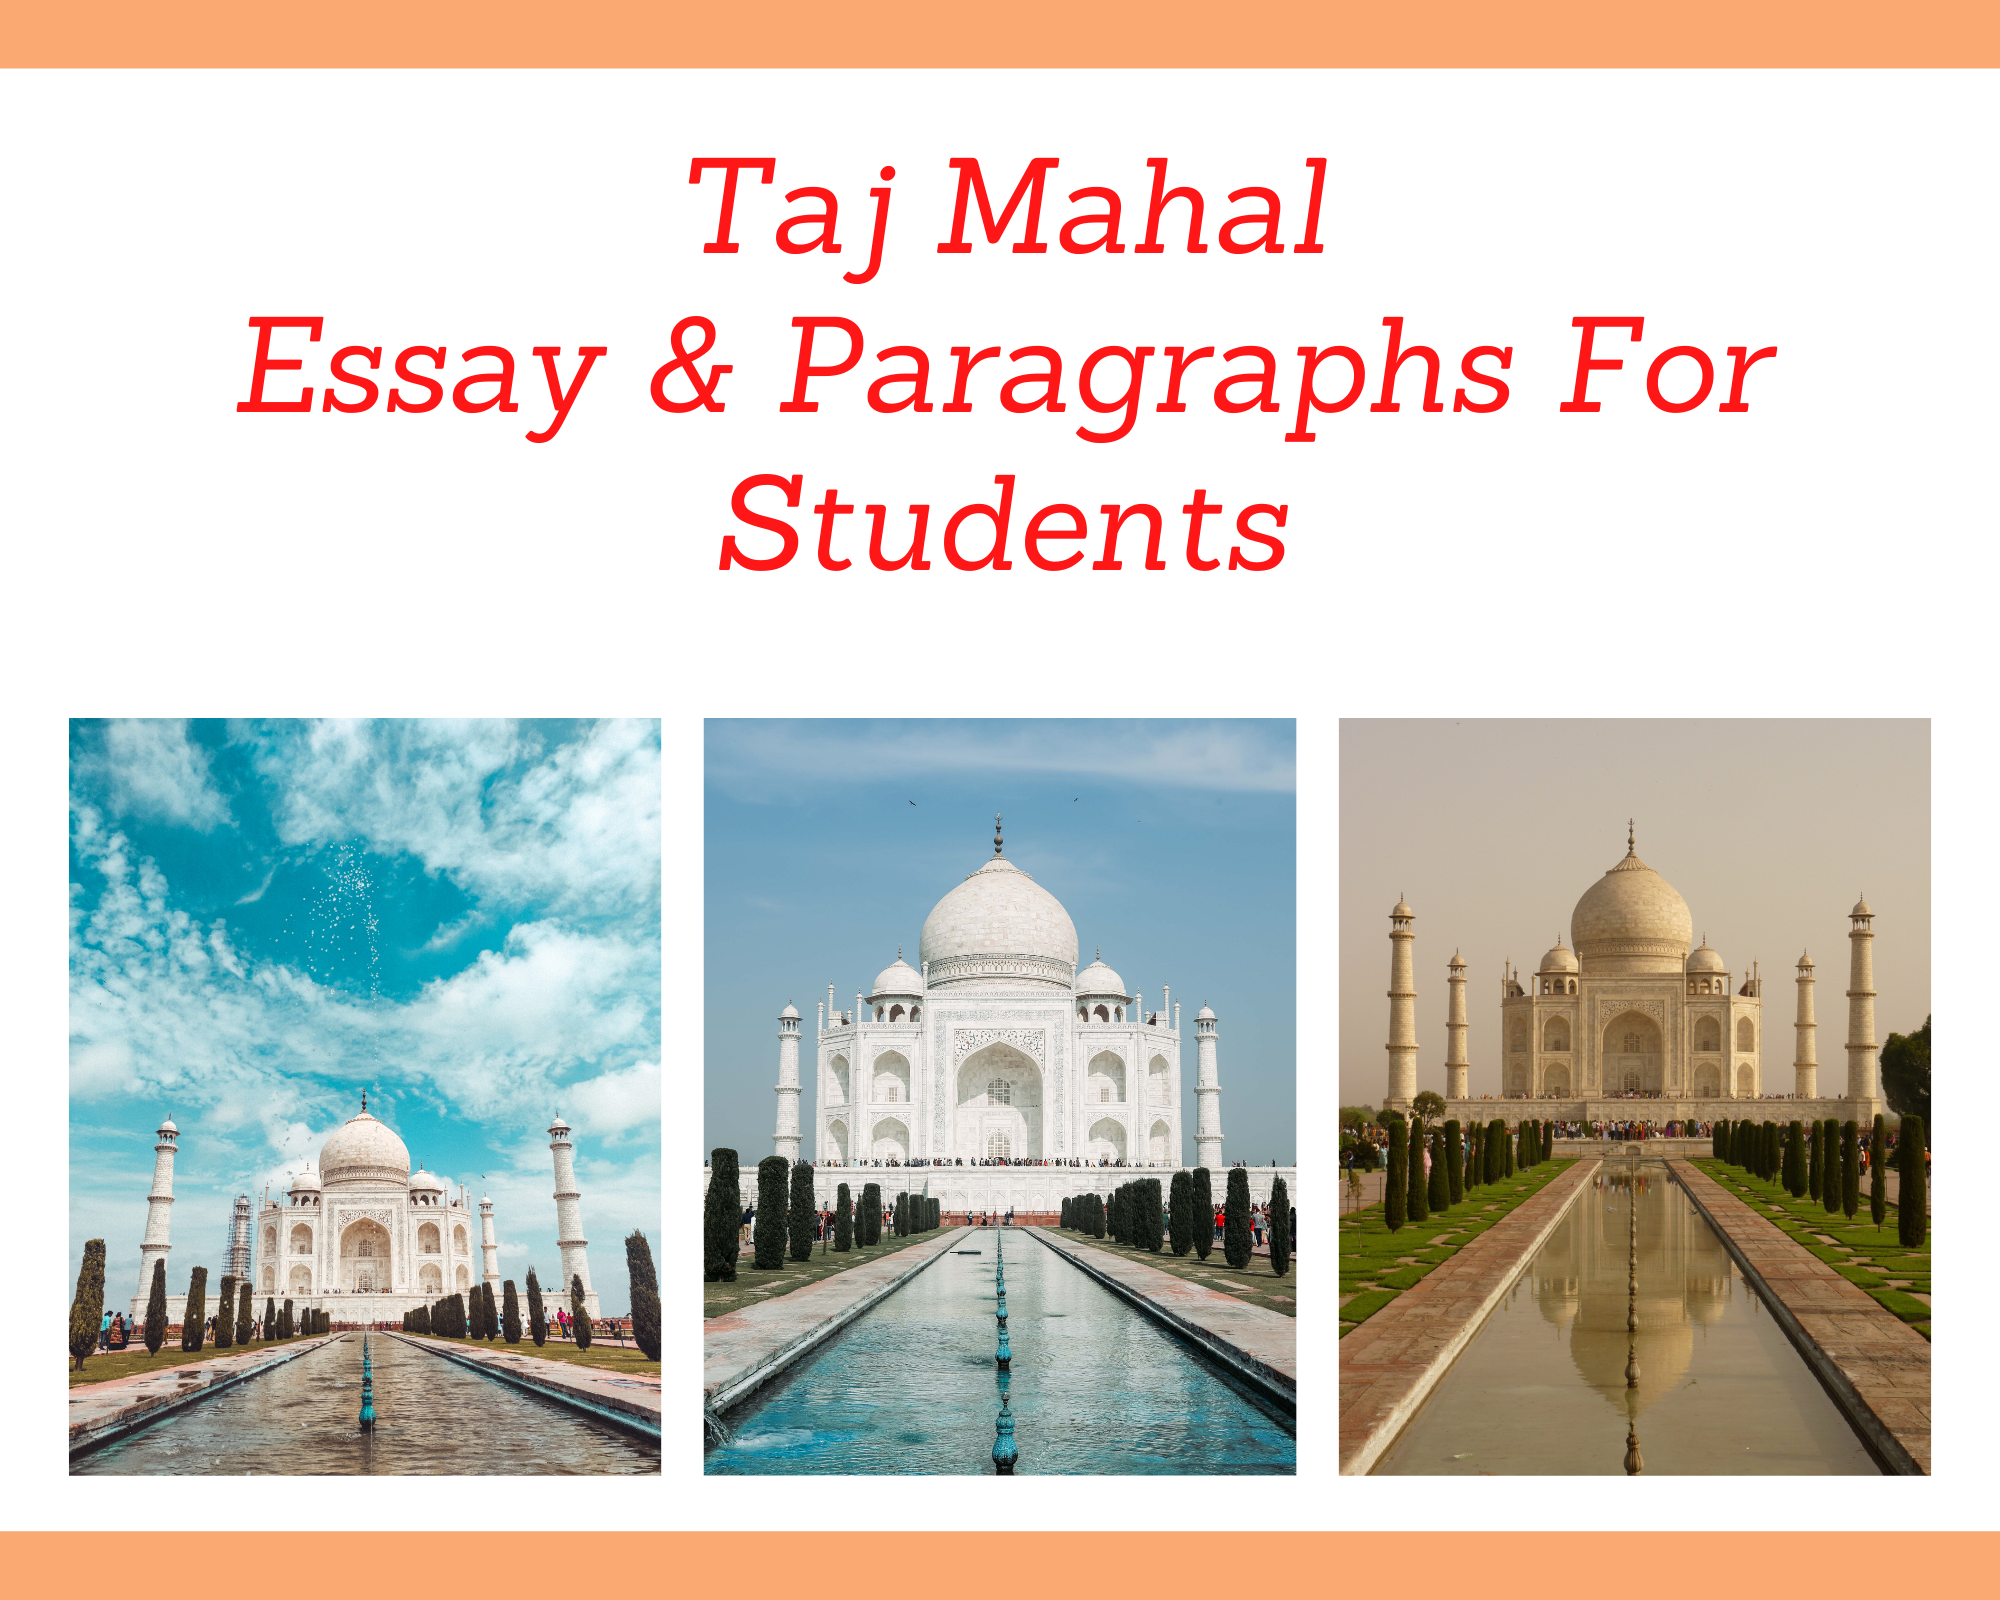 Essay on Taj Mahal